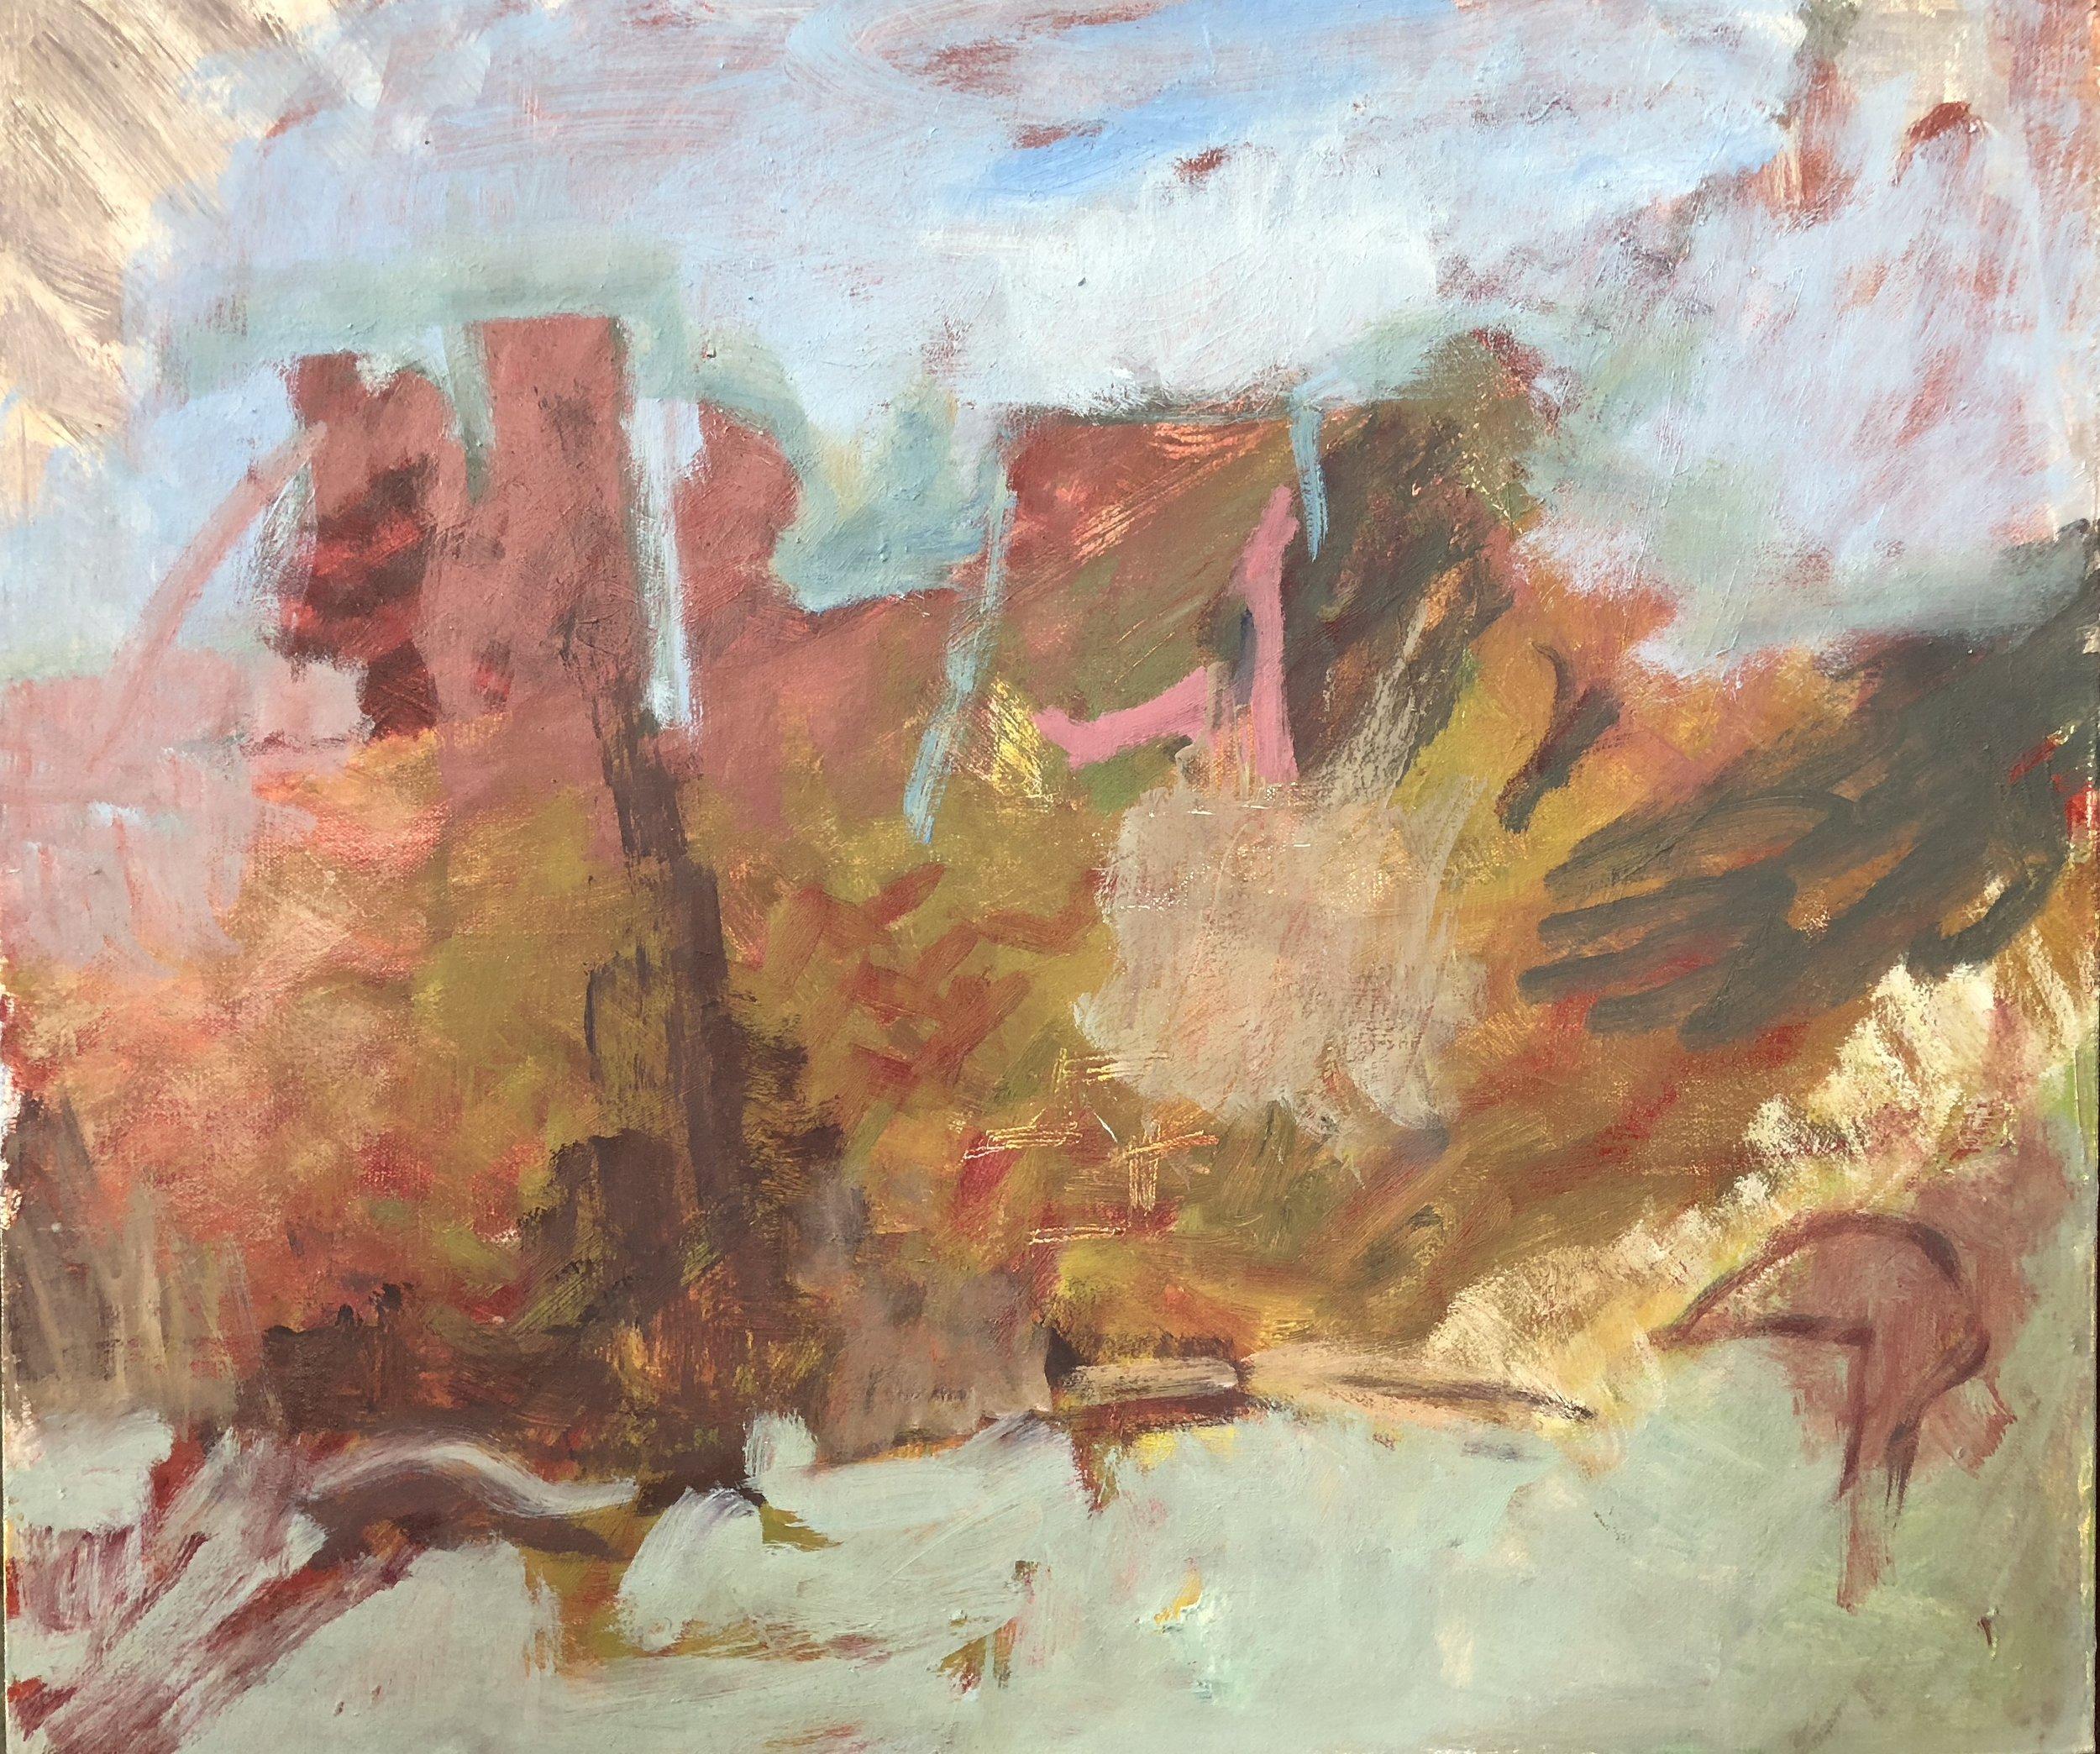 Landscape, oil on canvas